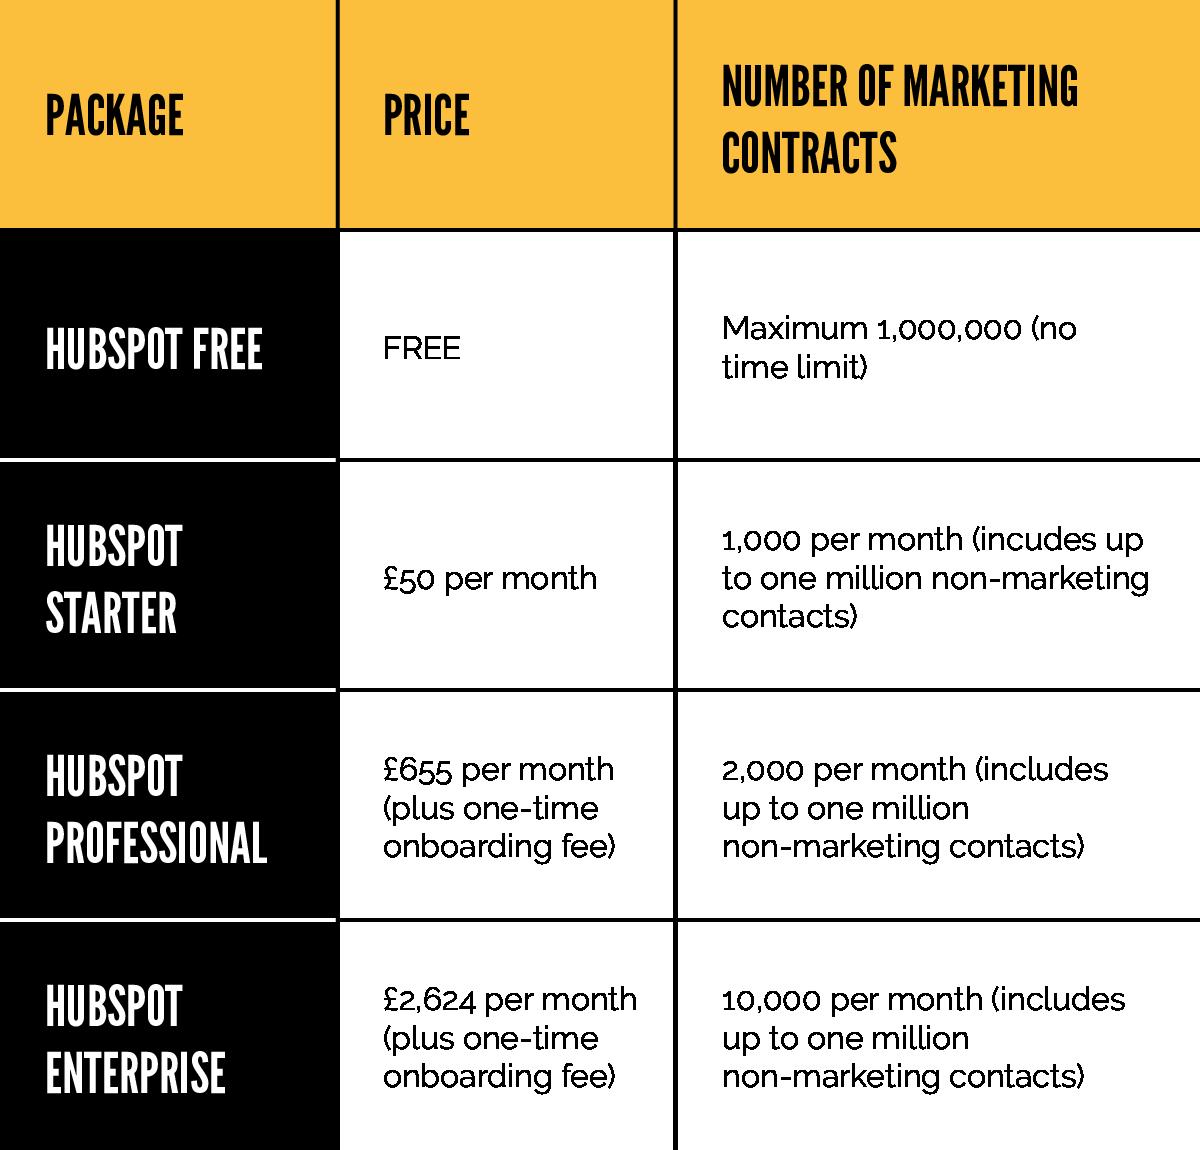 HubSpot pricing General@2x